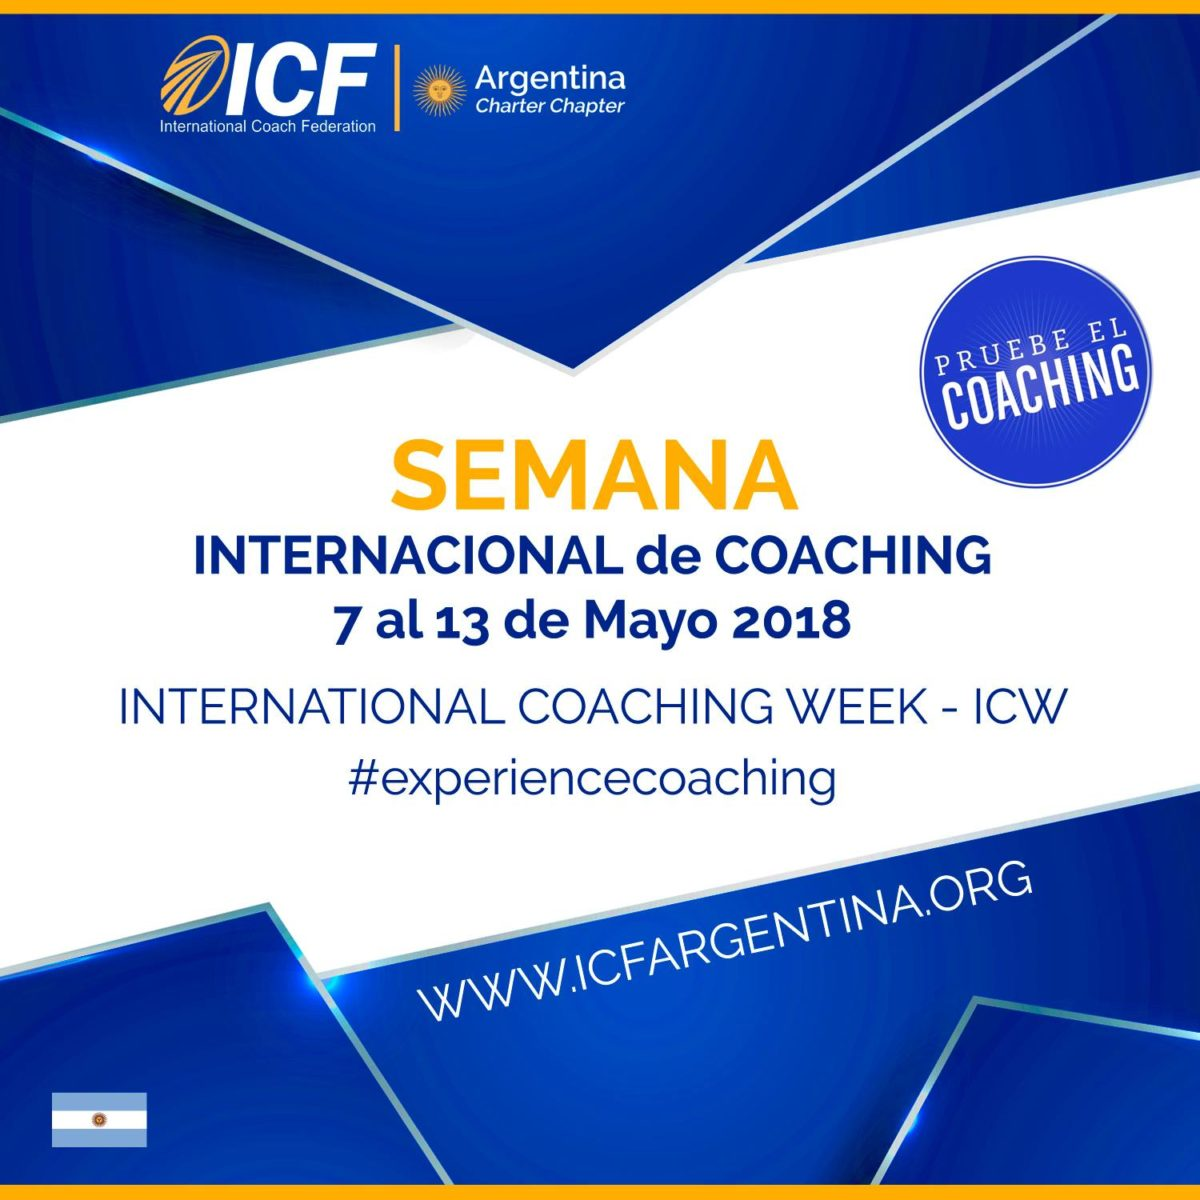 Semana Internacional del Coaching 2018